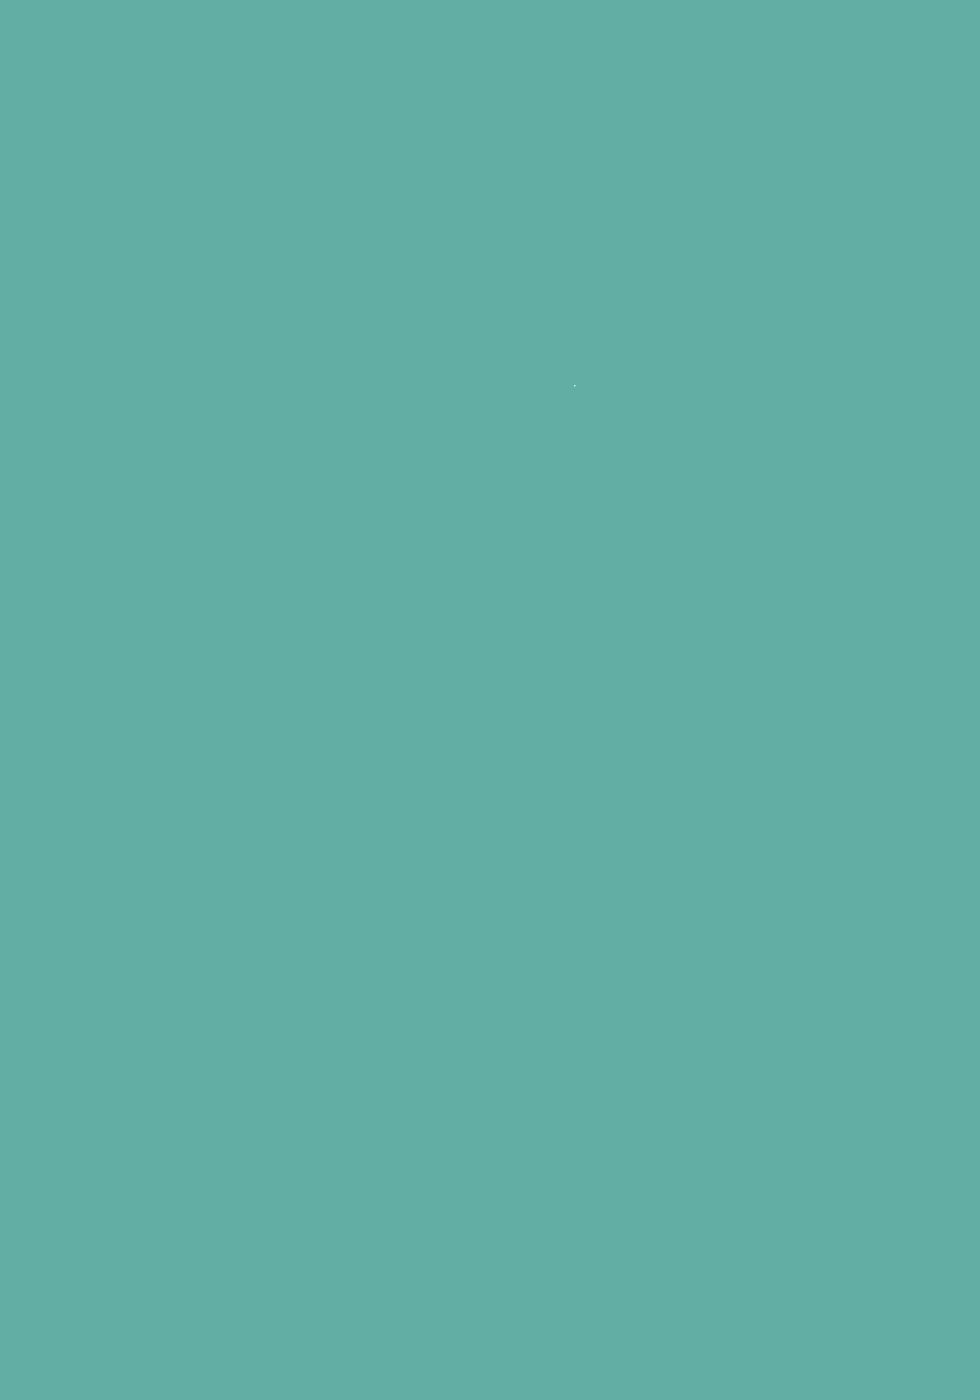 Soft Sweat jade blue 027